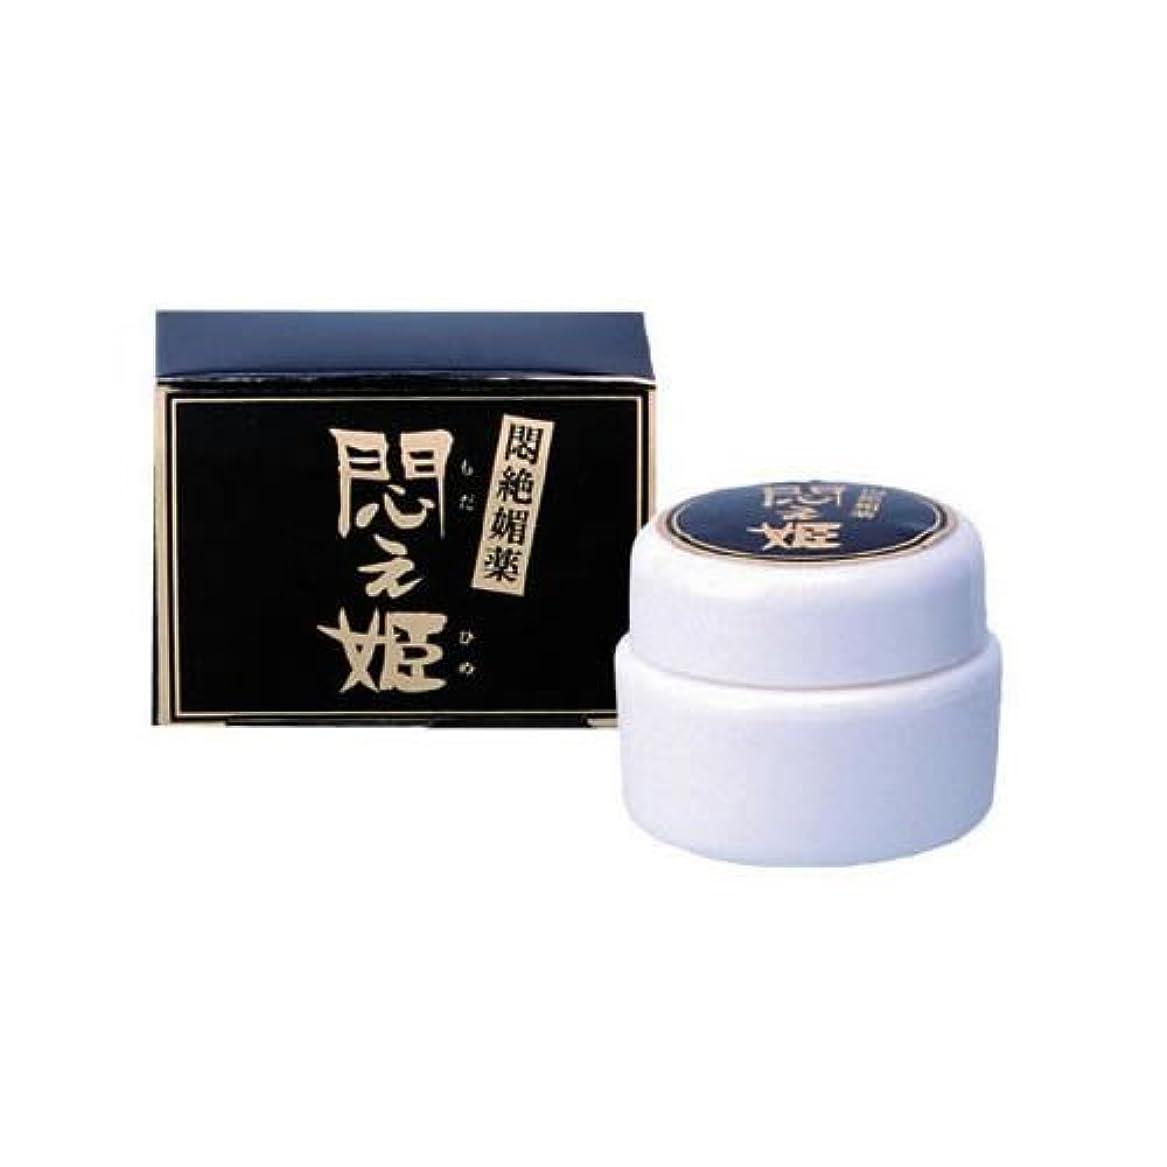 縁石石膏千悶え姫(5g)